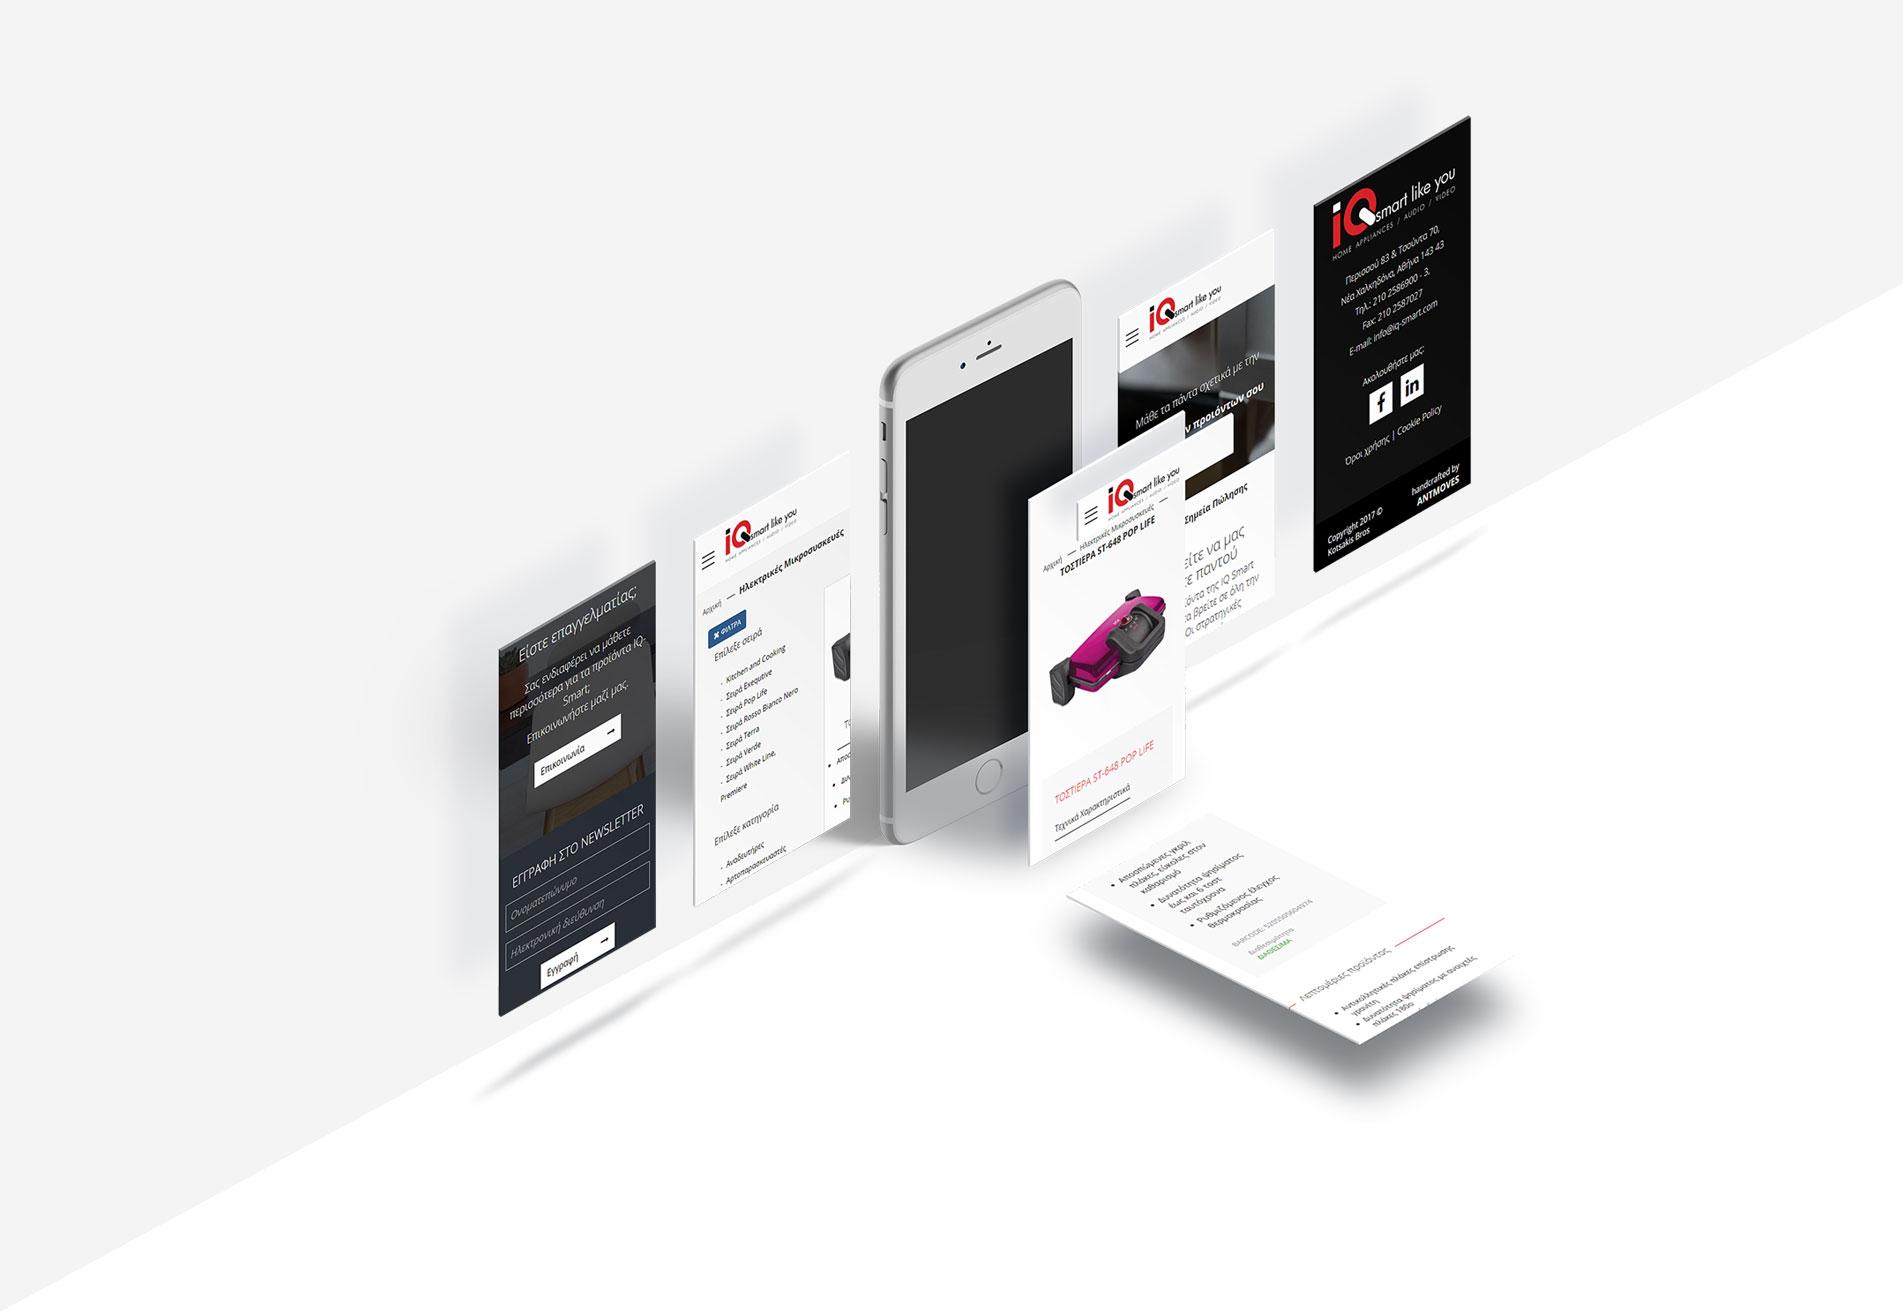 IQ-Smart multiple screens on iphone